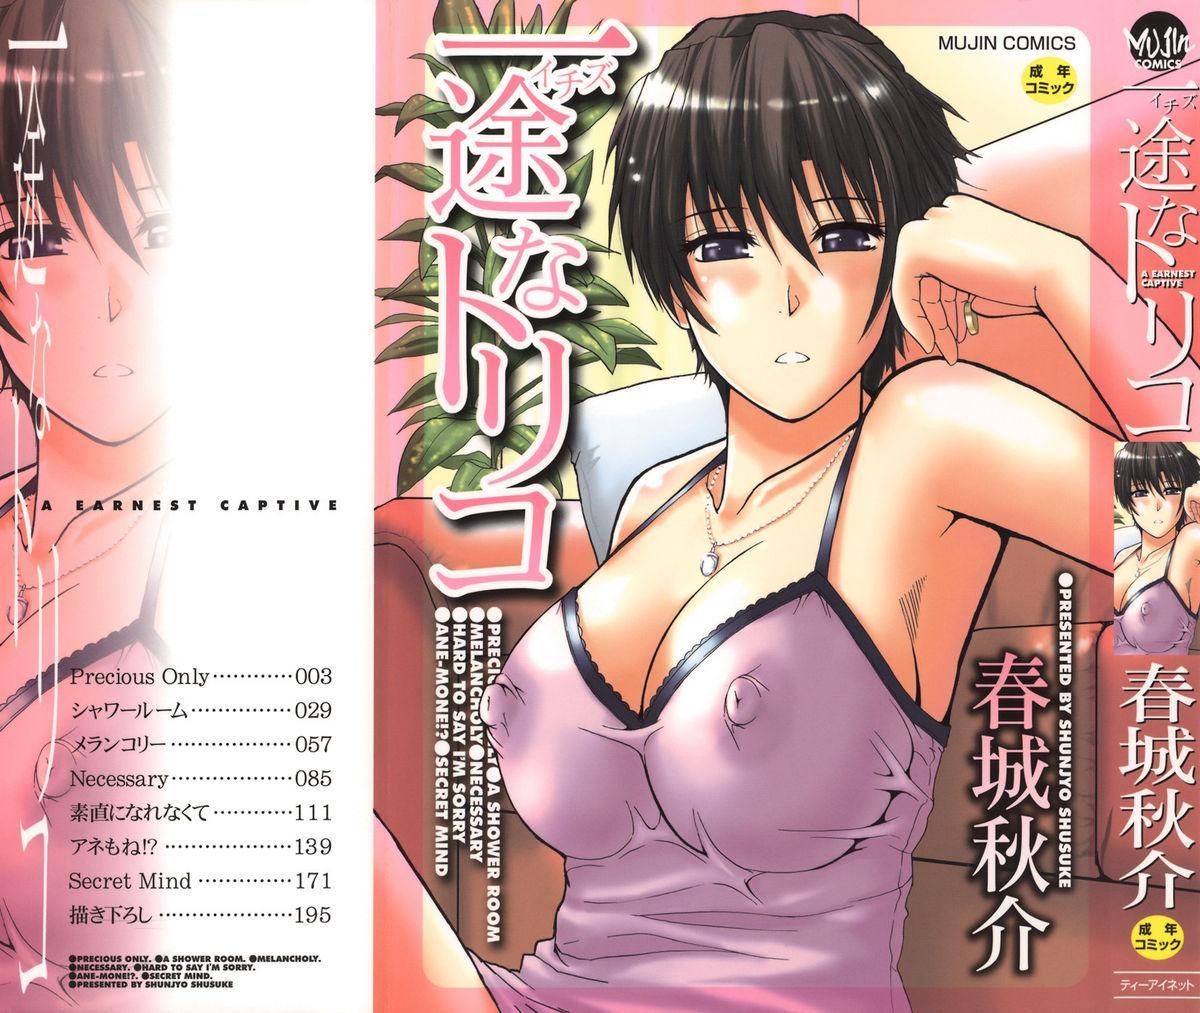 Ichizu na Toriko - A Earnest Captive 0